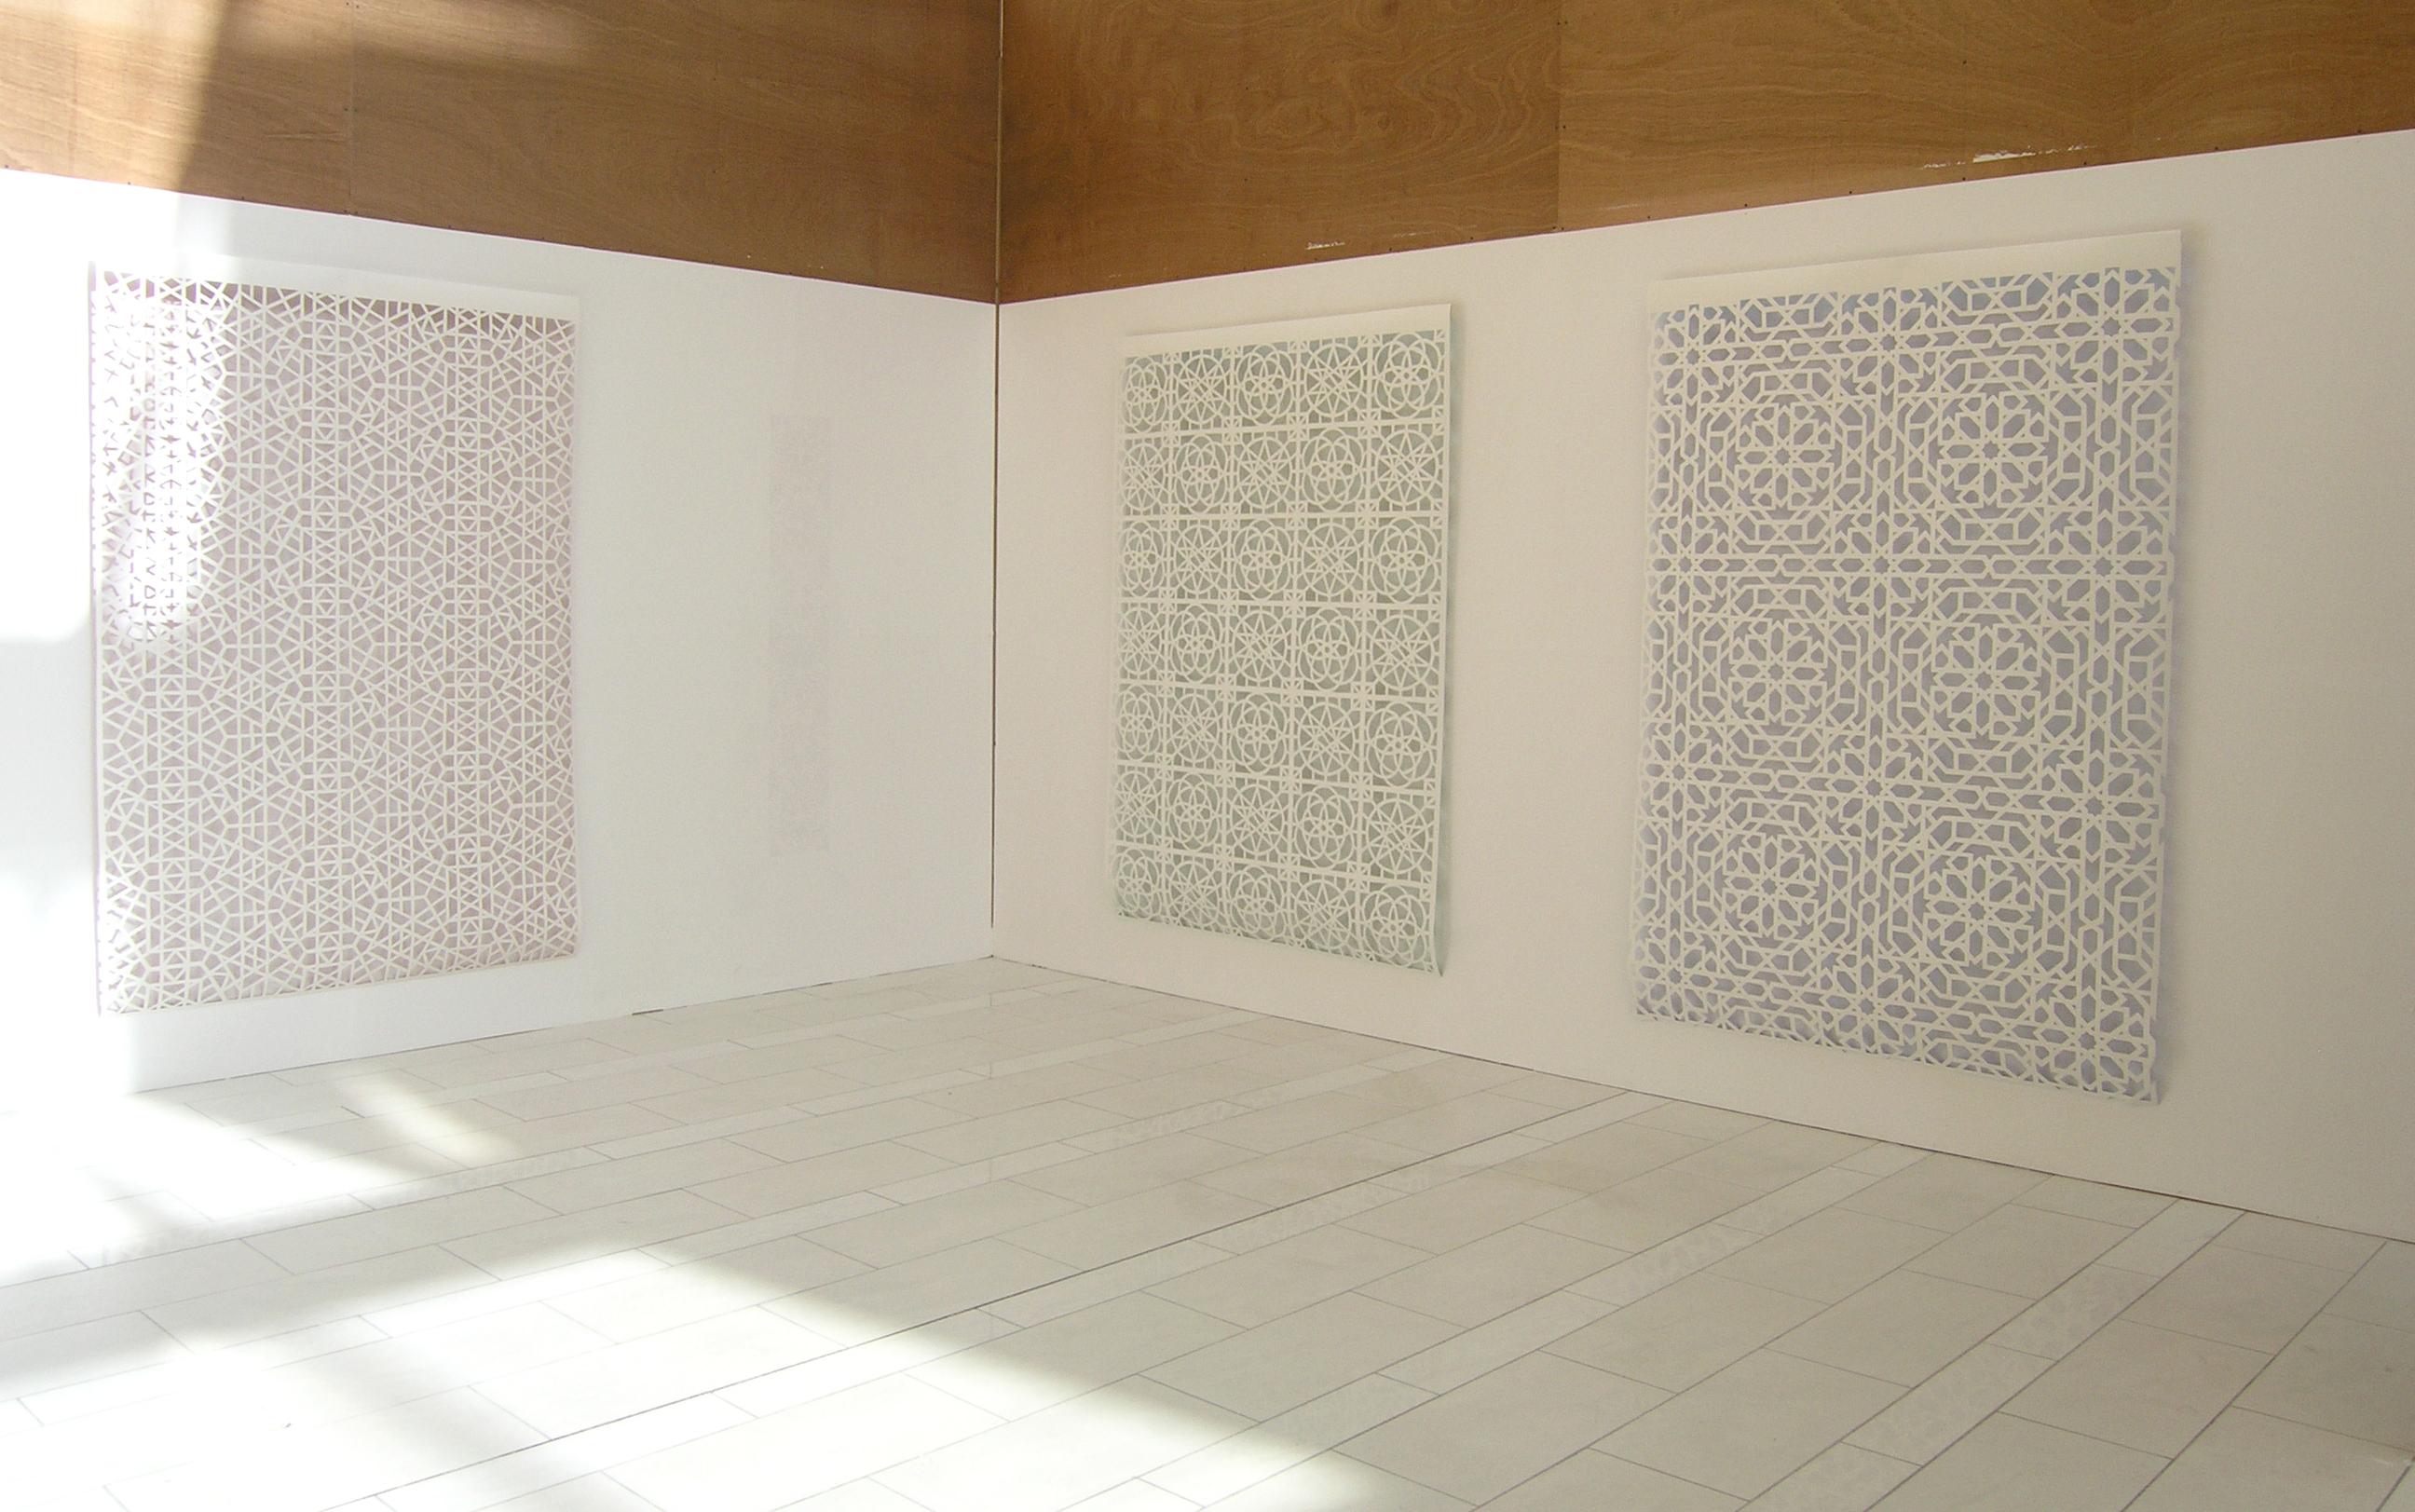 Geometic Aljamia: works of papercut art